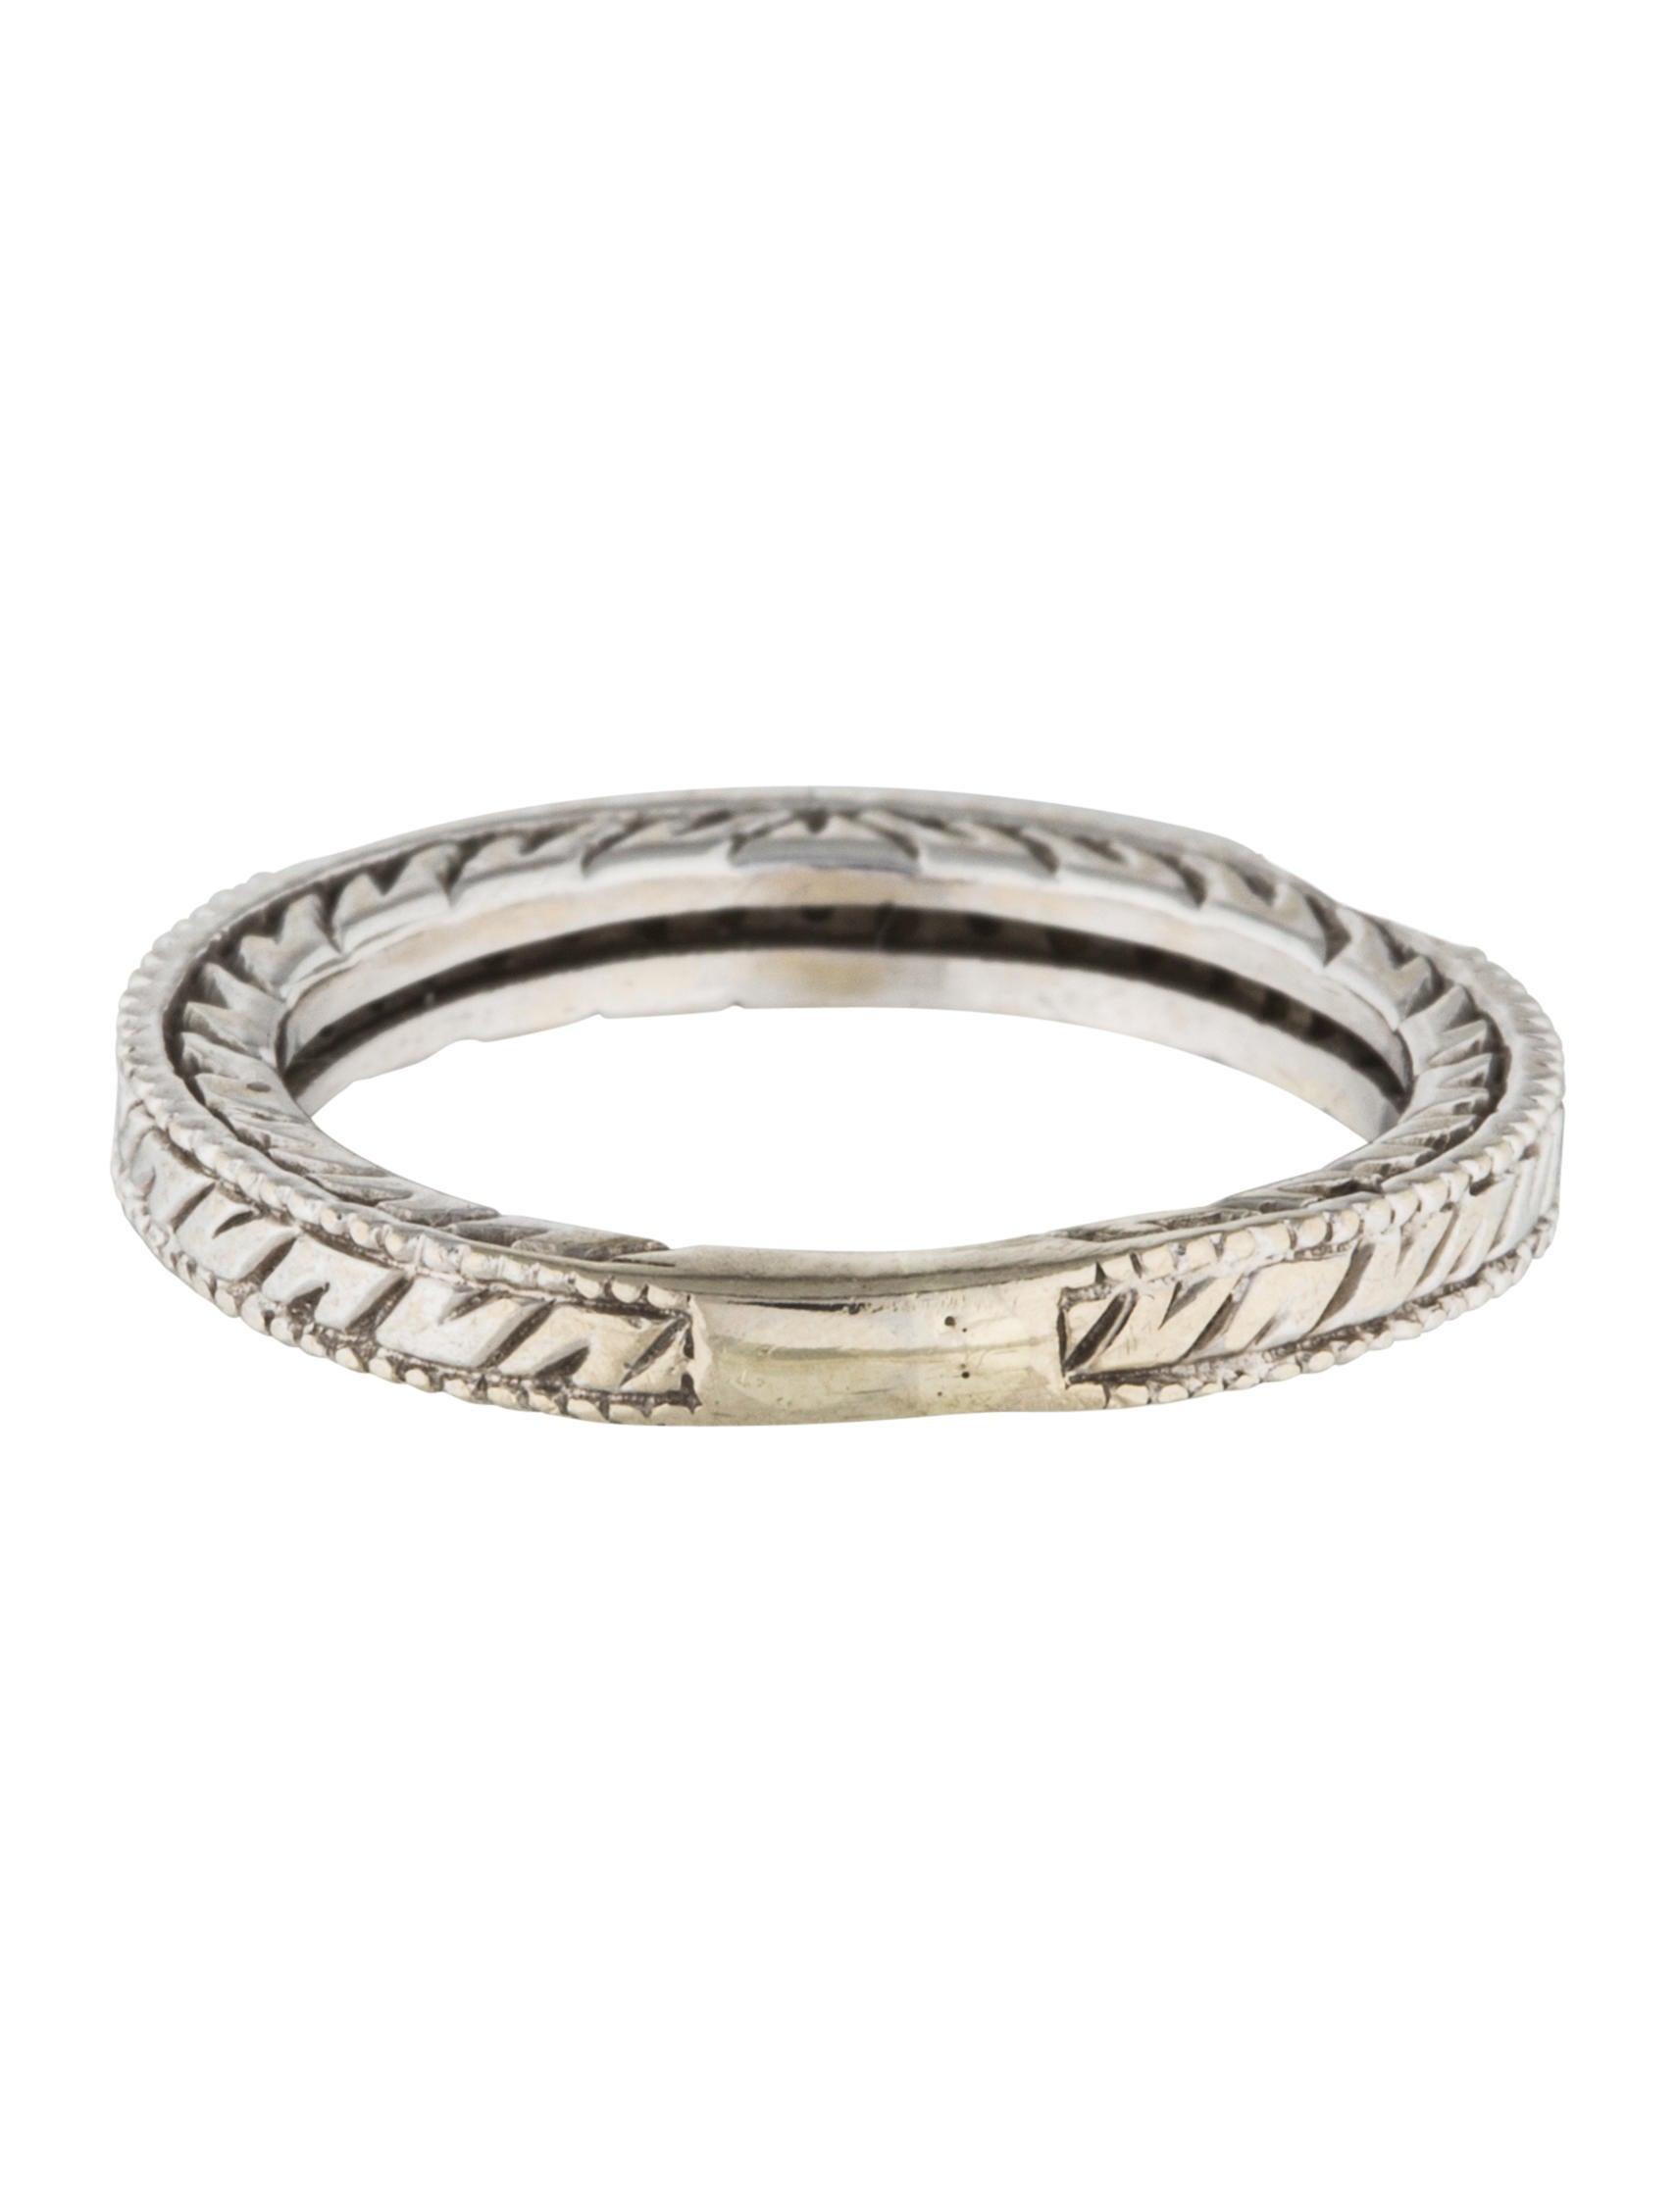 14k Diamond Half Eternity Band  Rings  Rring34569  The. Designer Ankle Bracelets. Diamond Ring And Band. Necklace Medallion. Dragonfly Pendant. Valentines Bracelet. Baptism Bracelet. Mens Gold Watches. Expensive Wedding Rings